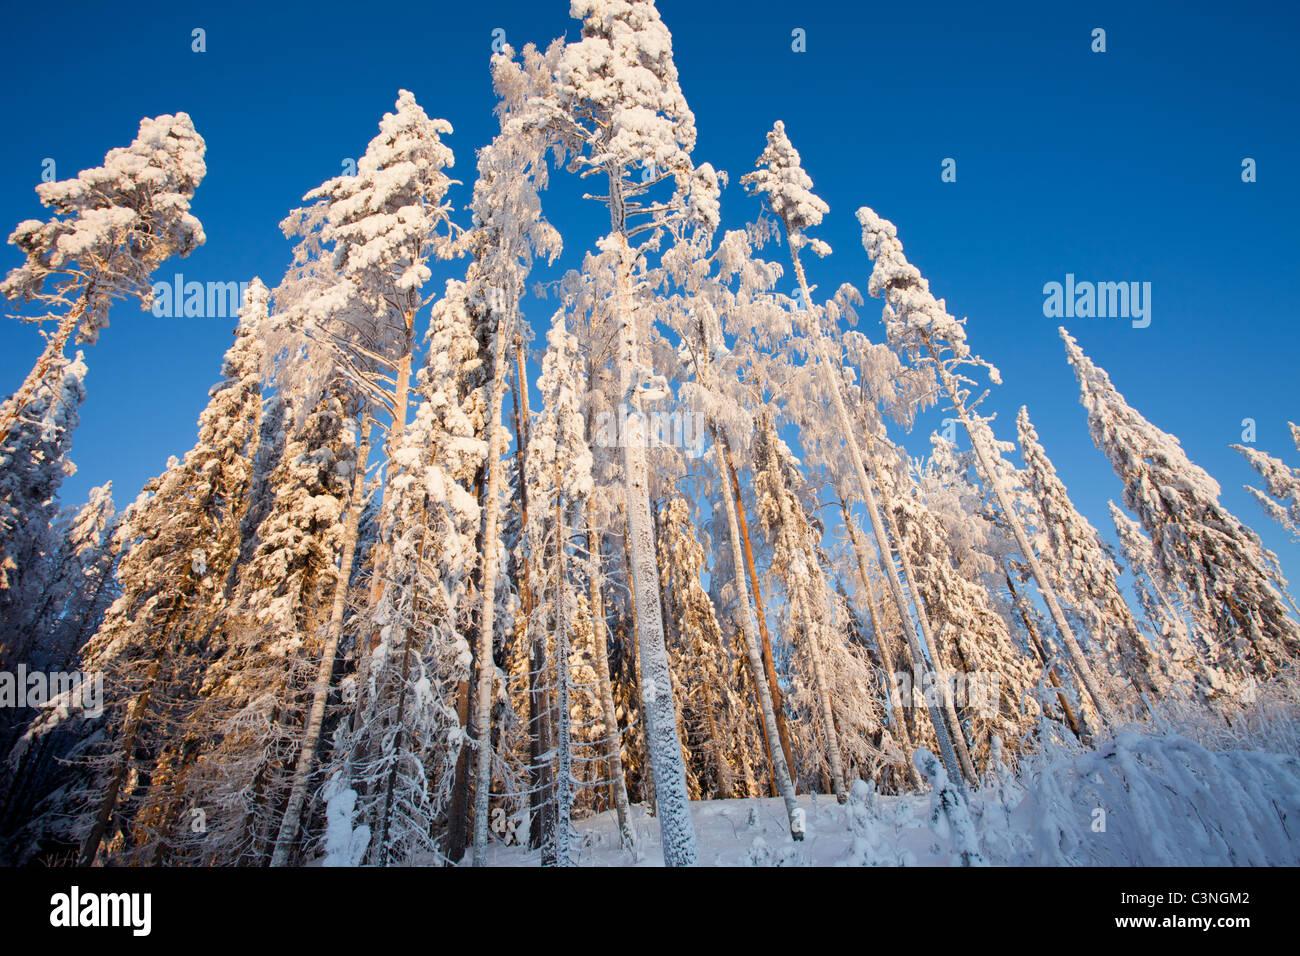 Coperta di neve pine ( Pinus sylvestris ) treetops in inverno , Finlandia Immagini Stock